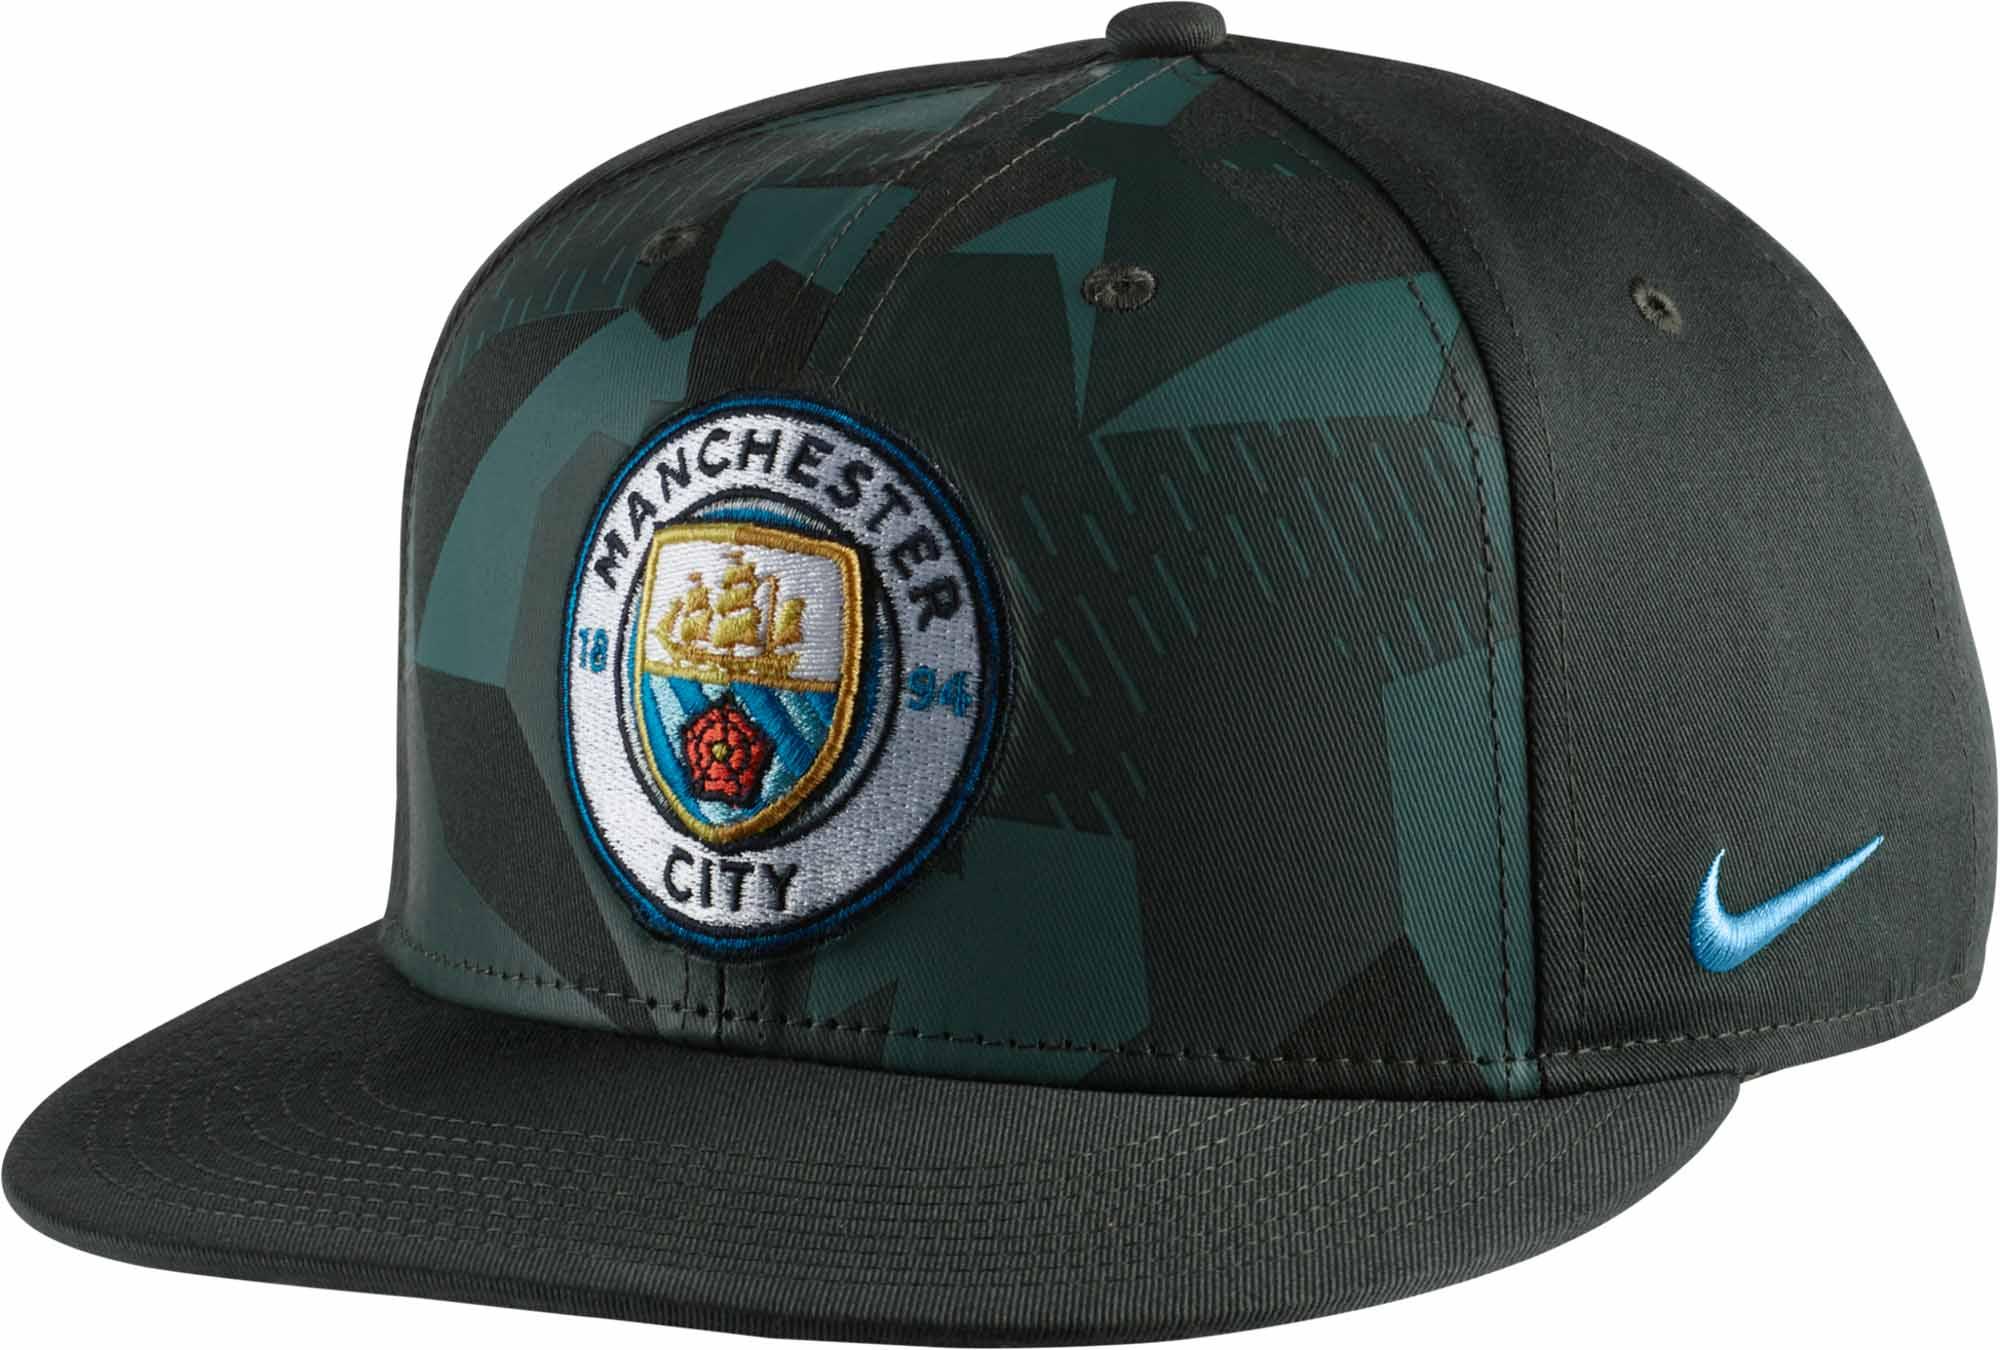 Nike Manchester City True Cap- Vintage Green Soccer Hat 5bdbeb2da21